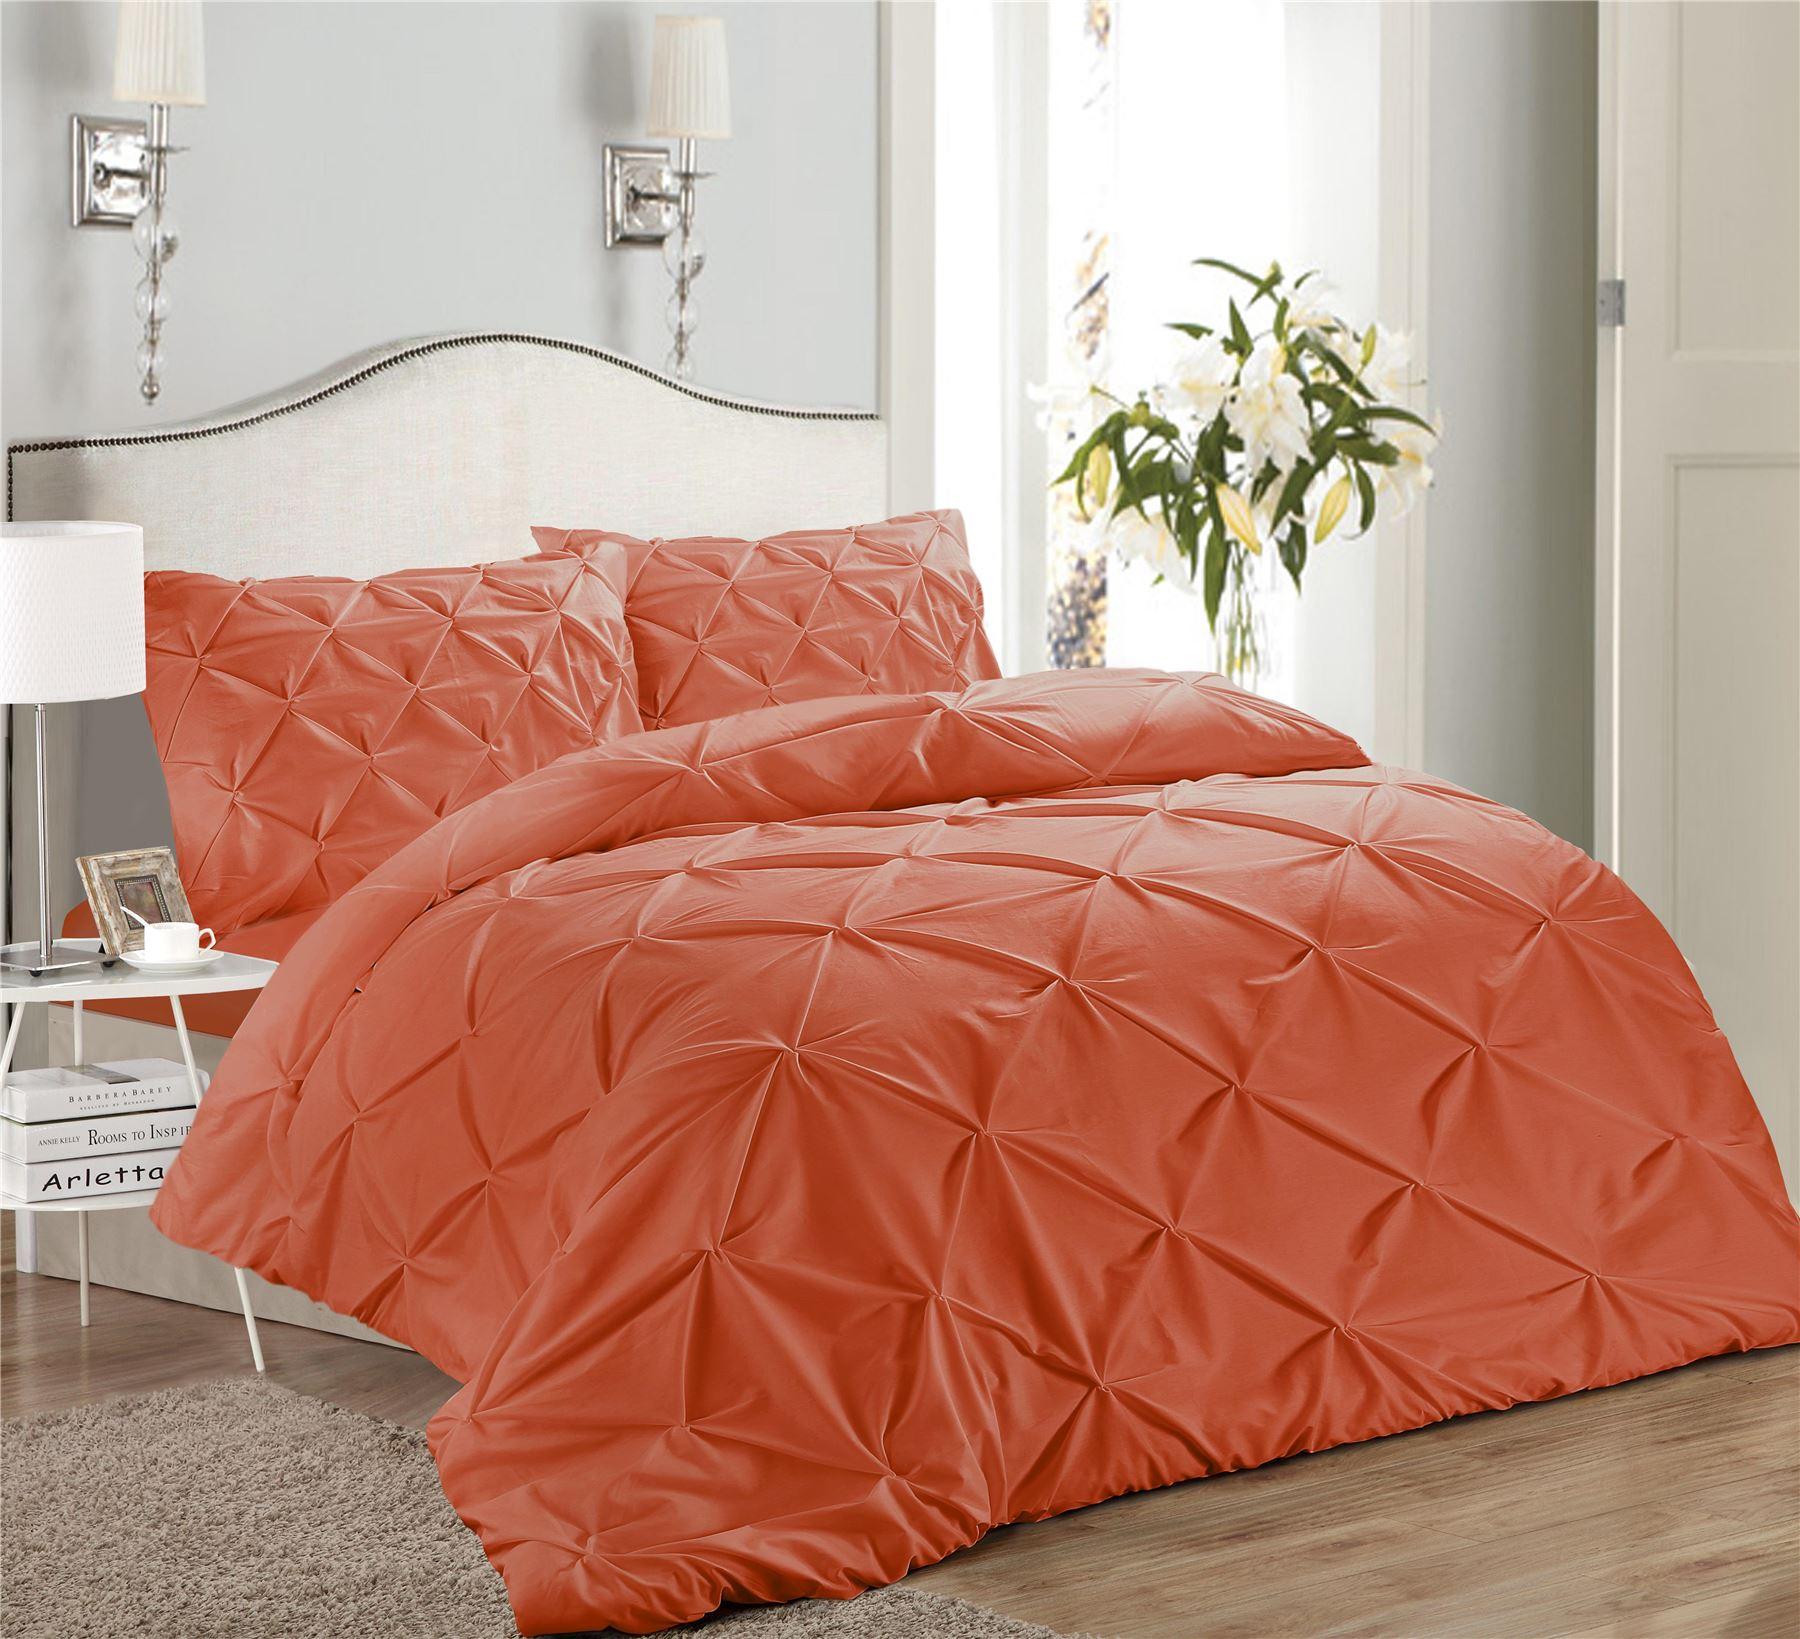 Luxury-Pure-100-Cotton-200-Thread-Pinch-Pleat-Pintuck-Puckering-Duvet-Cover-Set thumbnail 25